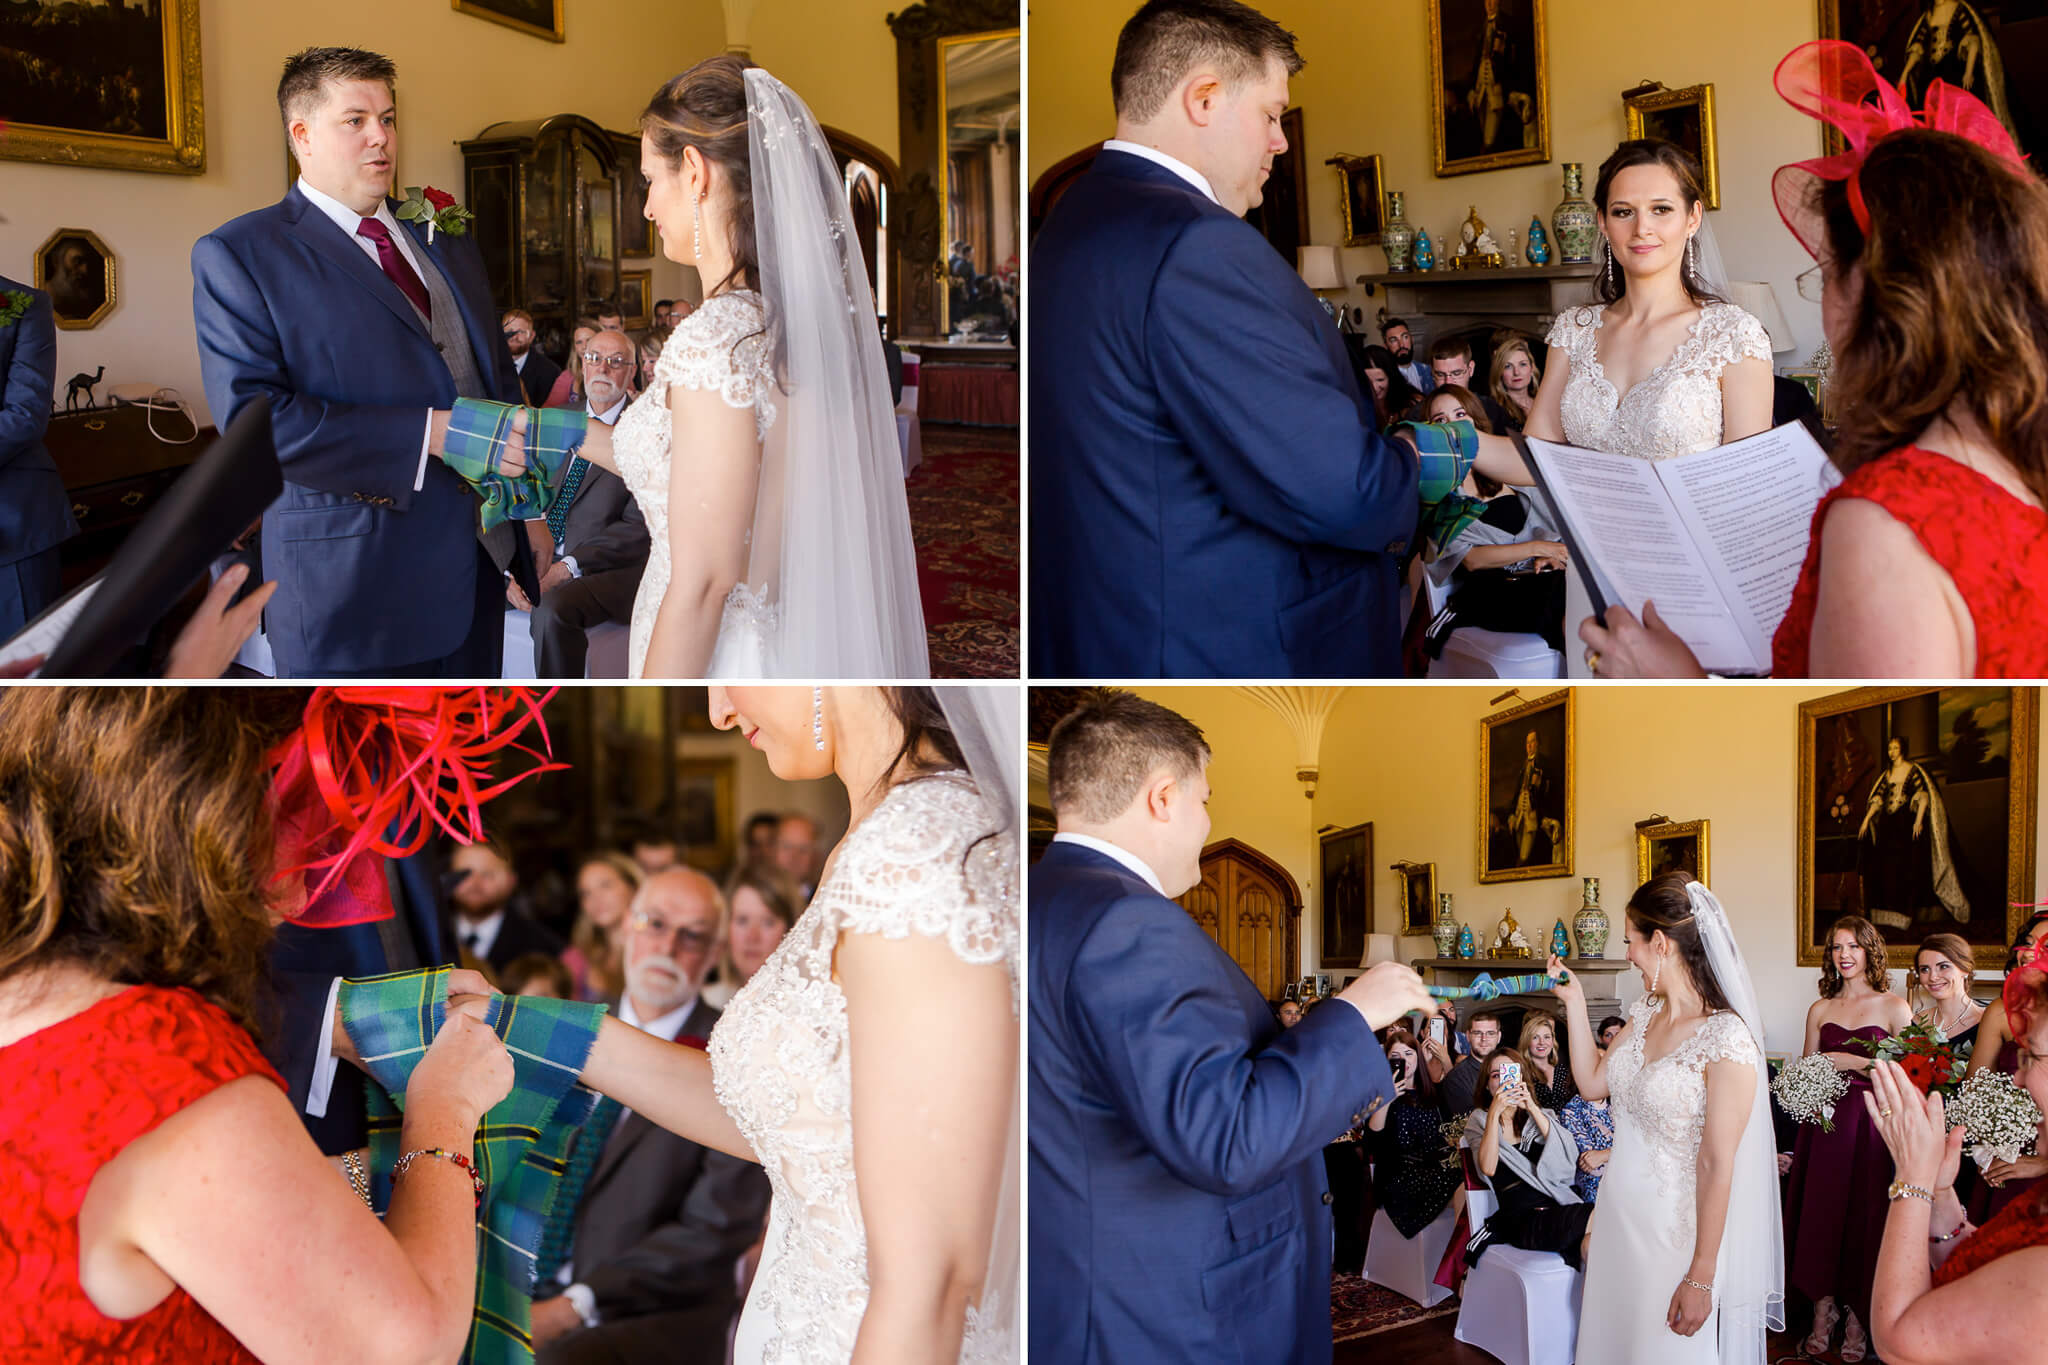 duns-castle-wedding-photograper-scotland-stanbury-photography-010